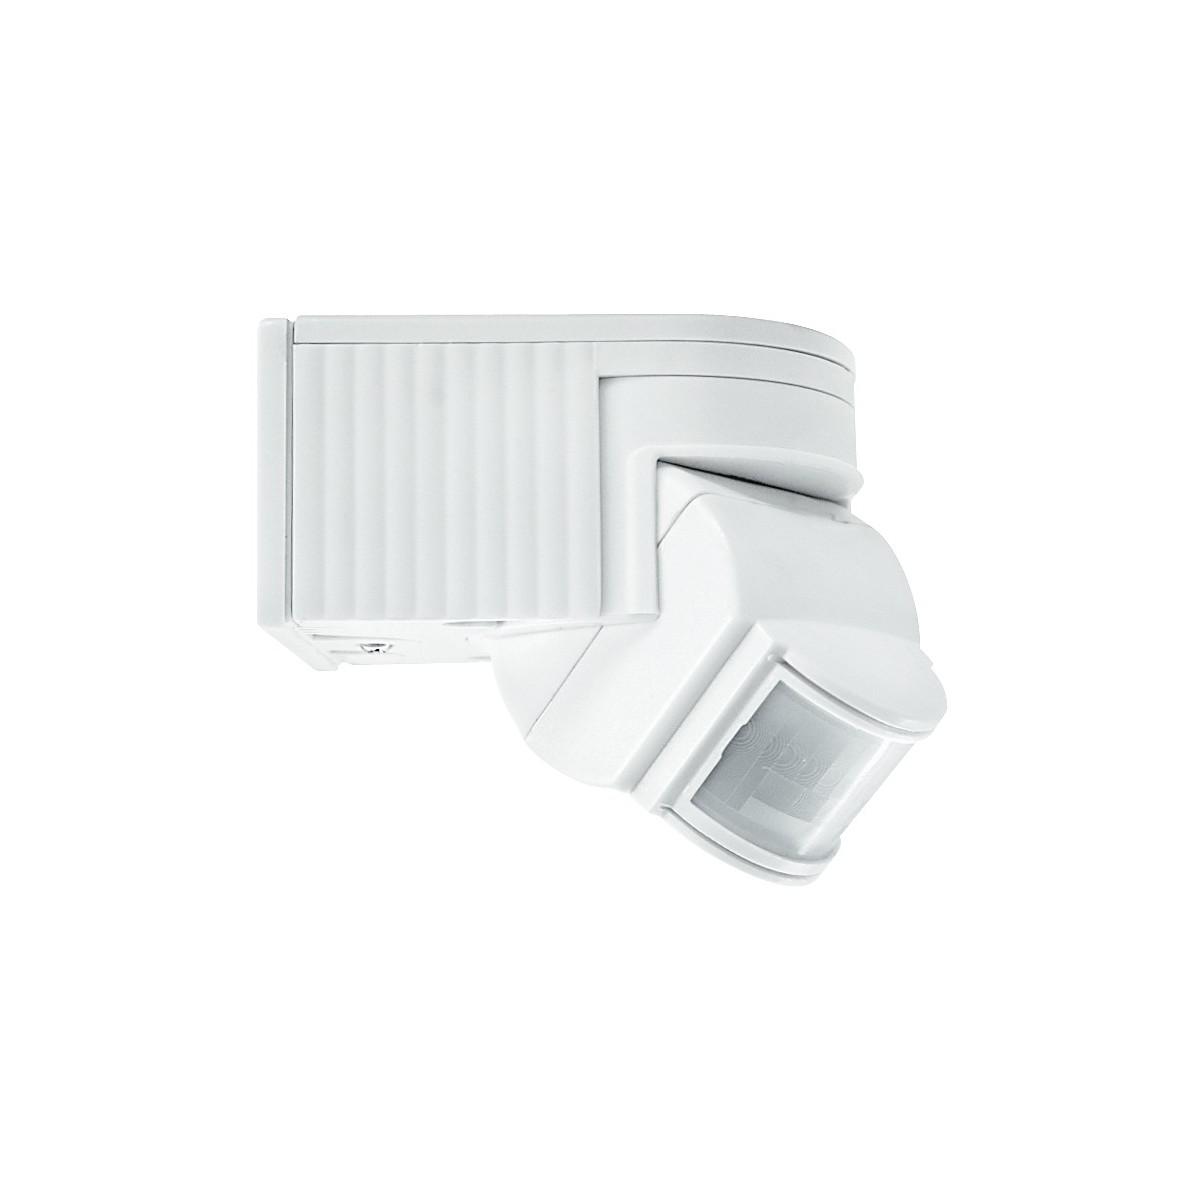 I-SENSOR-180 - Capteur de mouvement blanc 180 ° 1000 watts